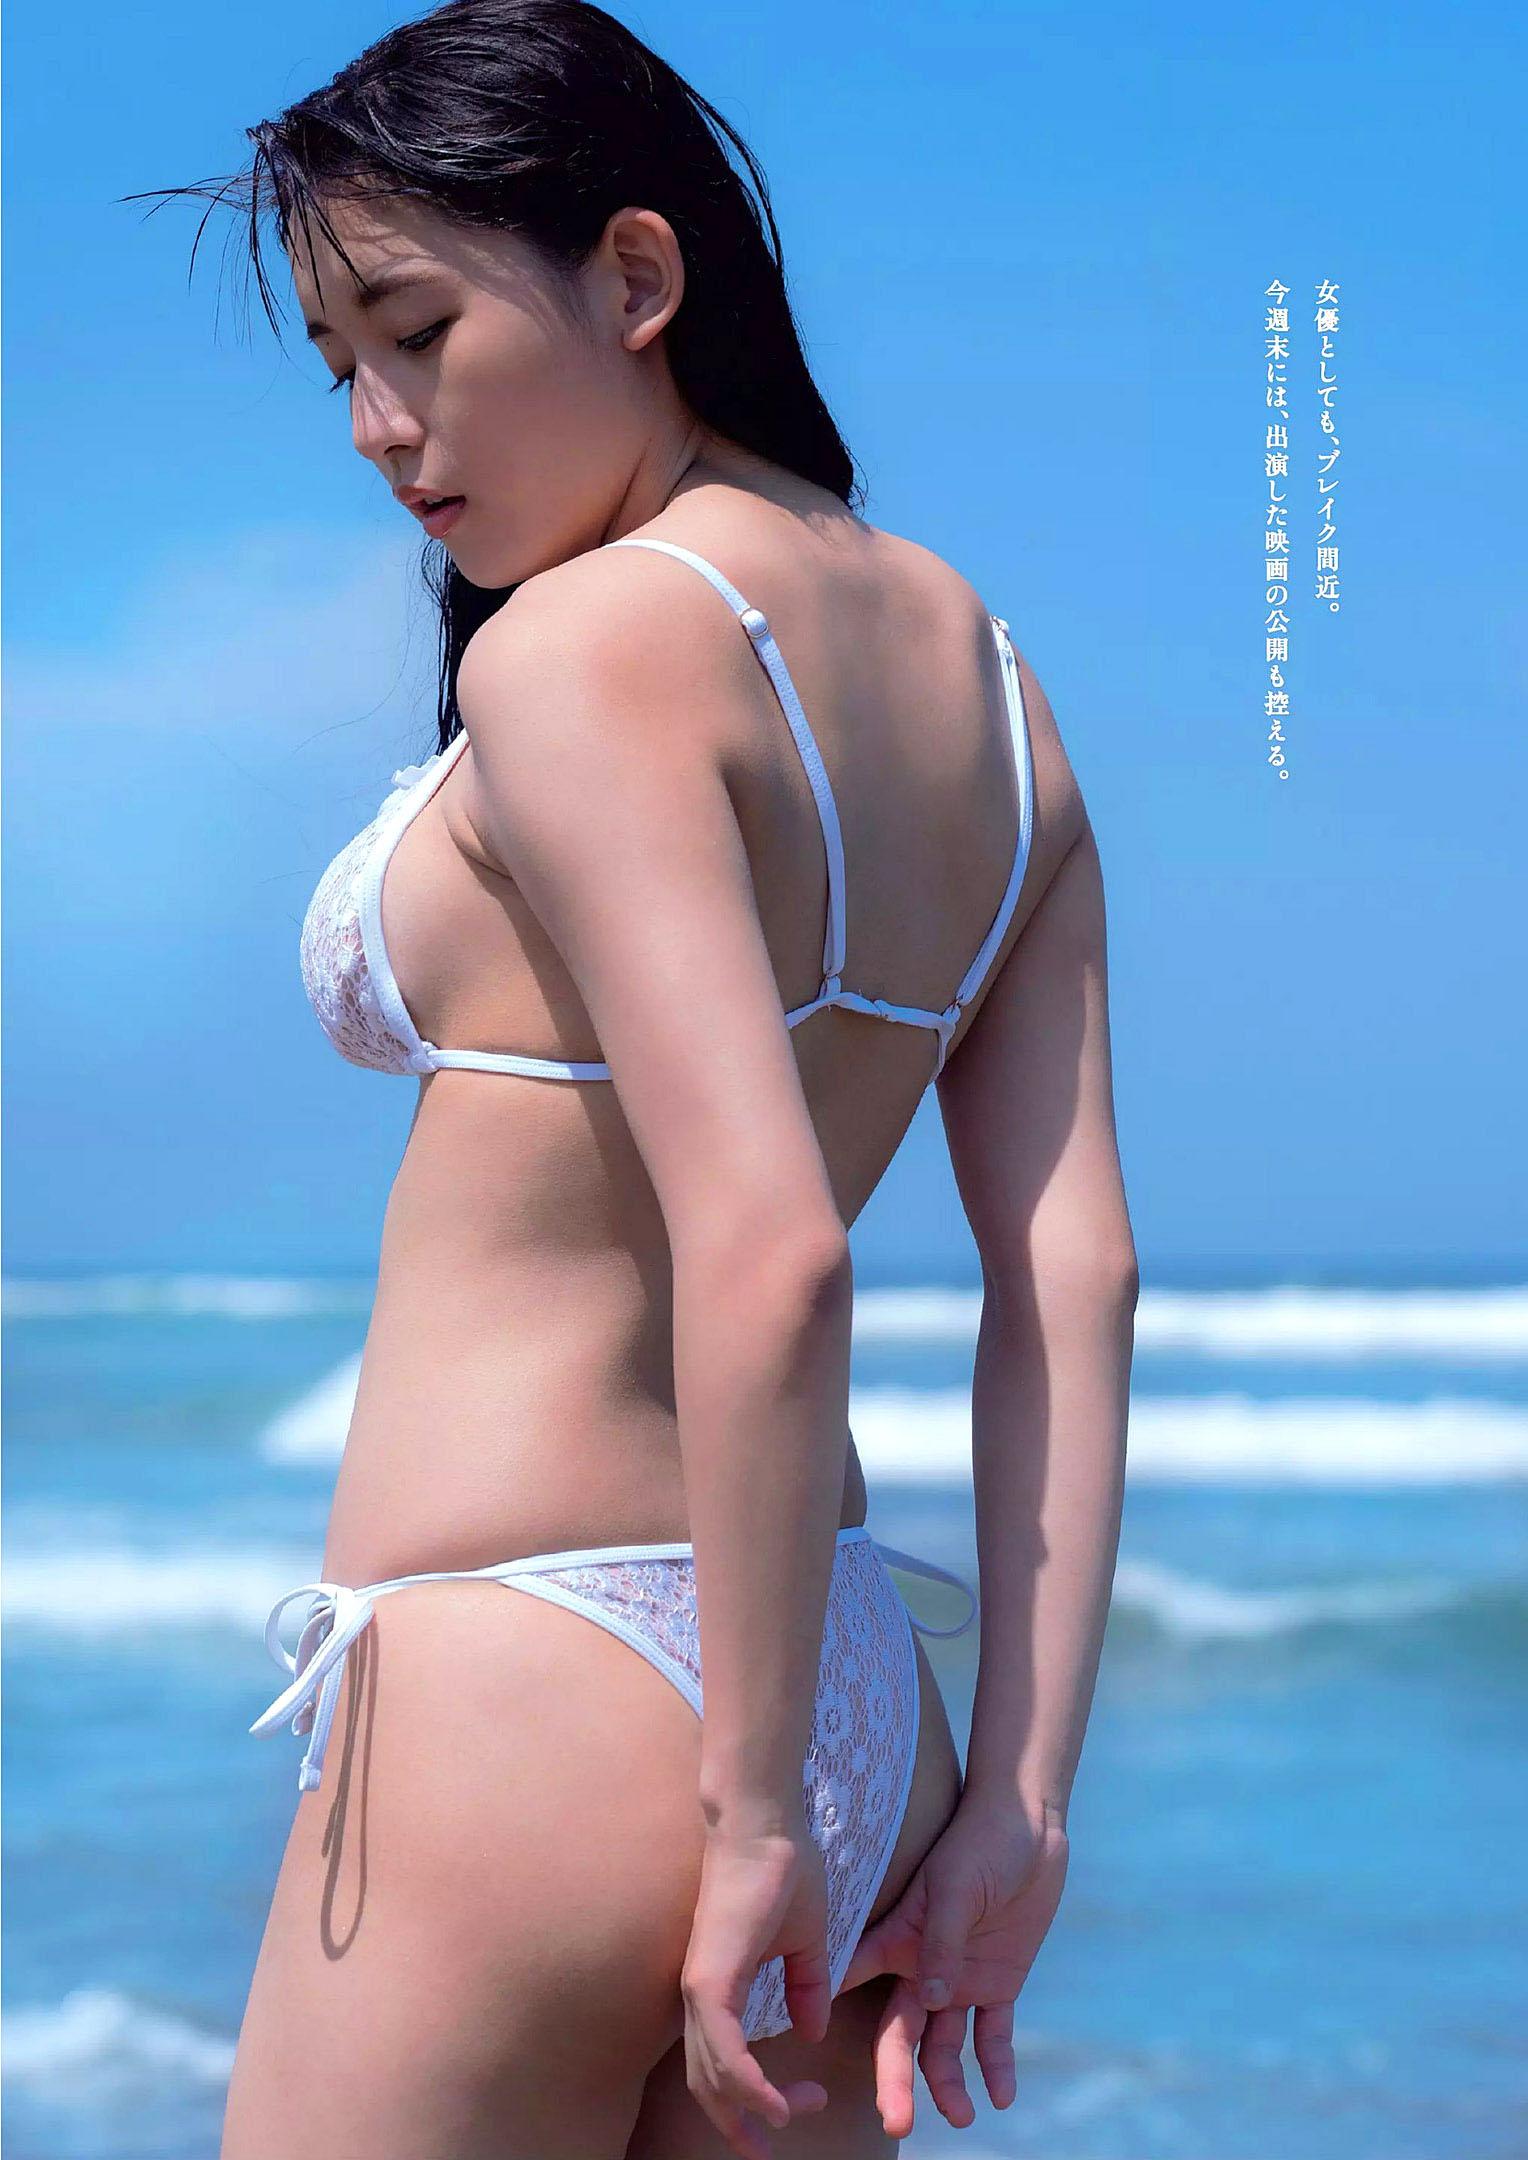 Nana Asakawa WBP 190916 07.jpg